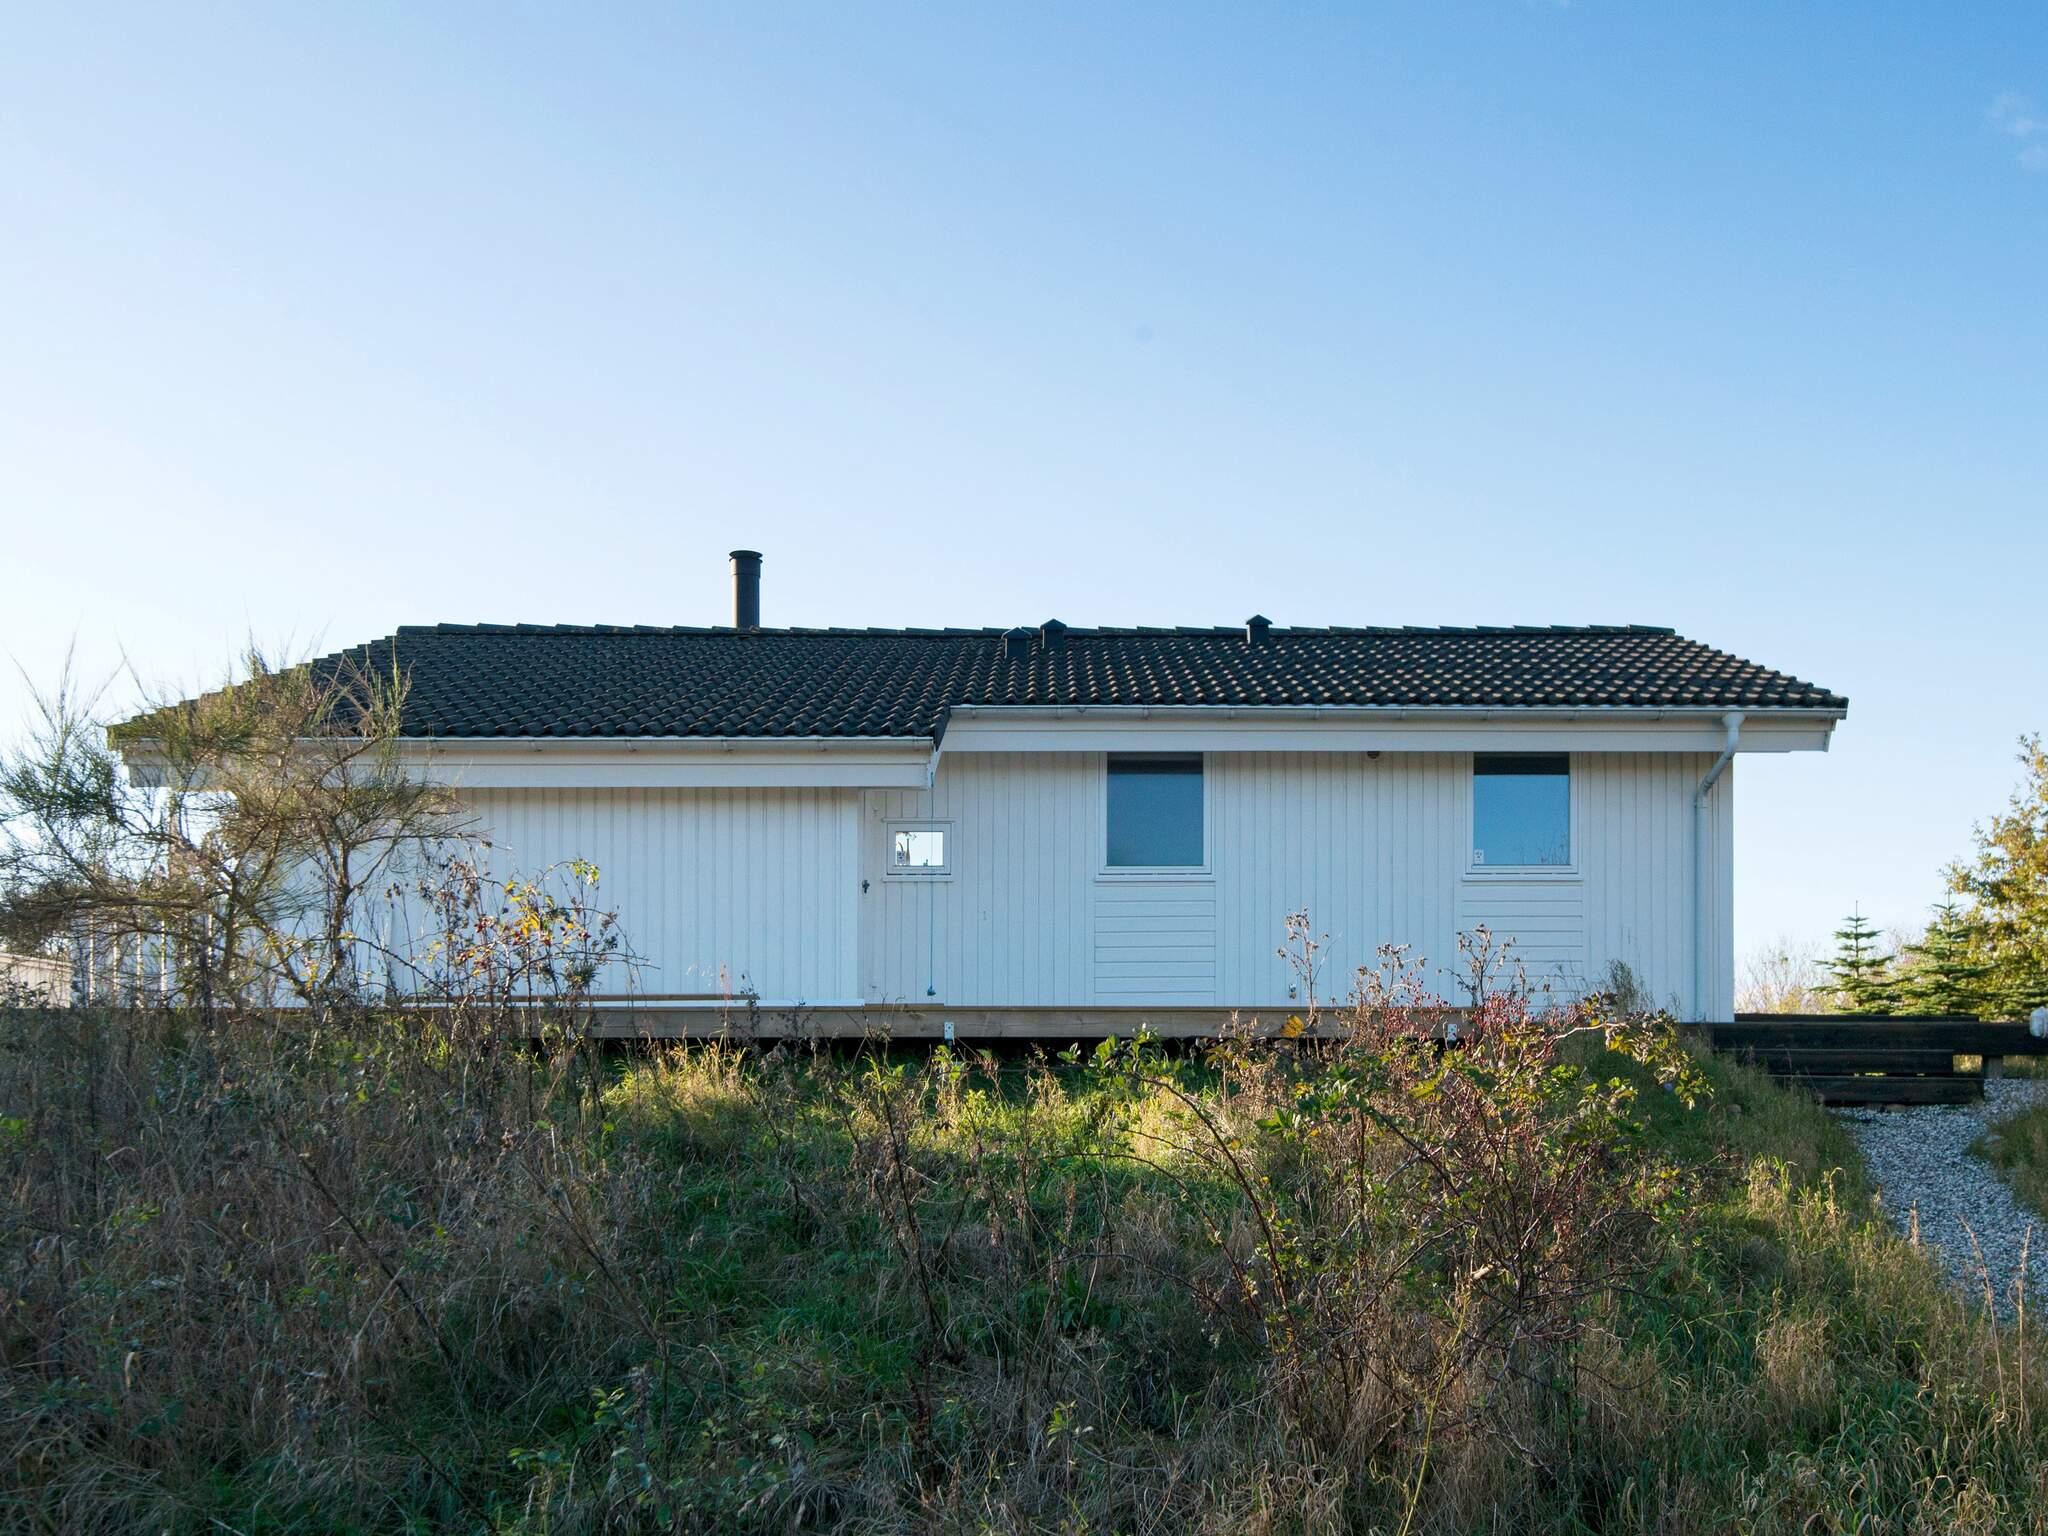 Maison de vacances Helgenæs (681779), Knebel, , Mer Baltique danoise, Danemark, image 18